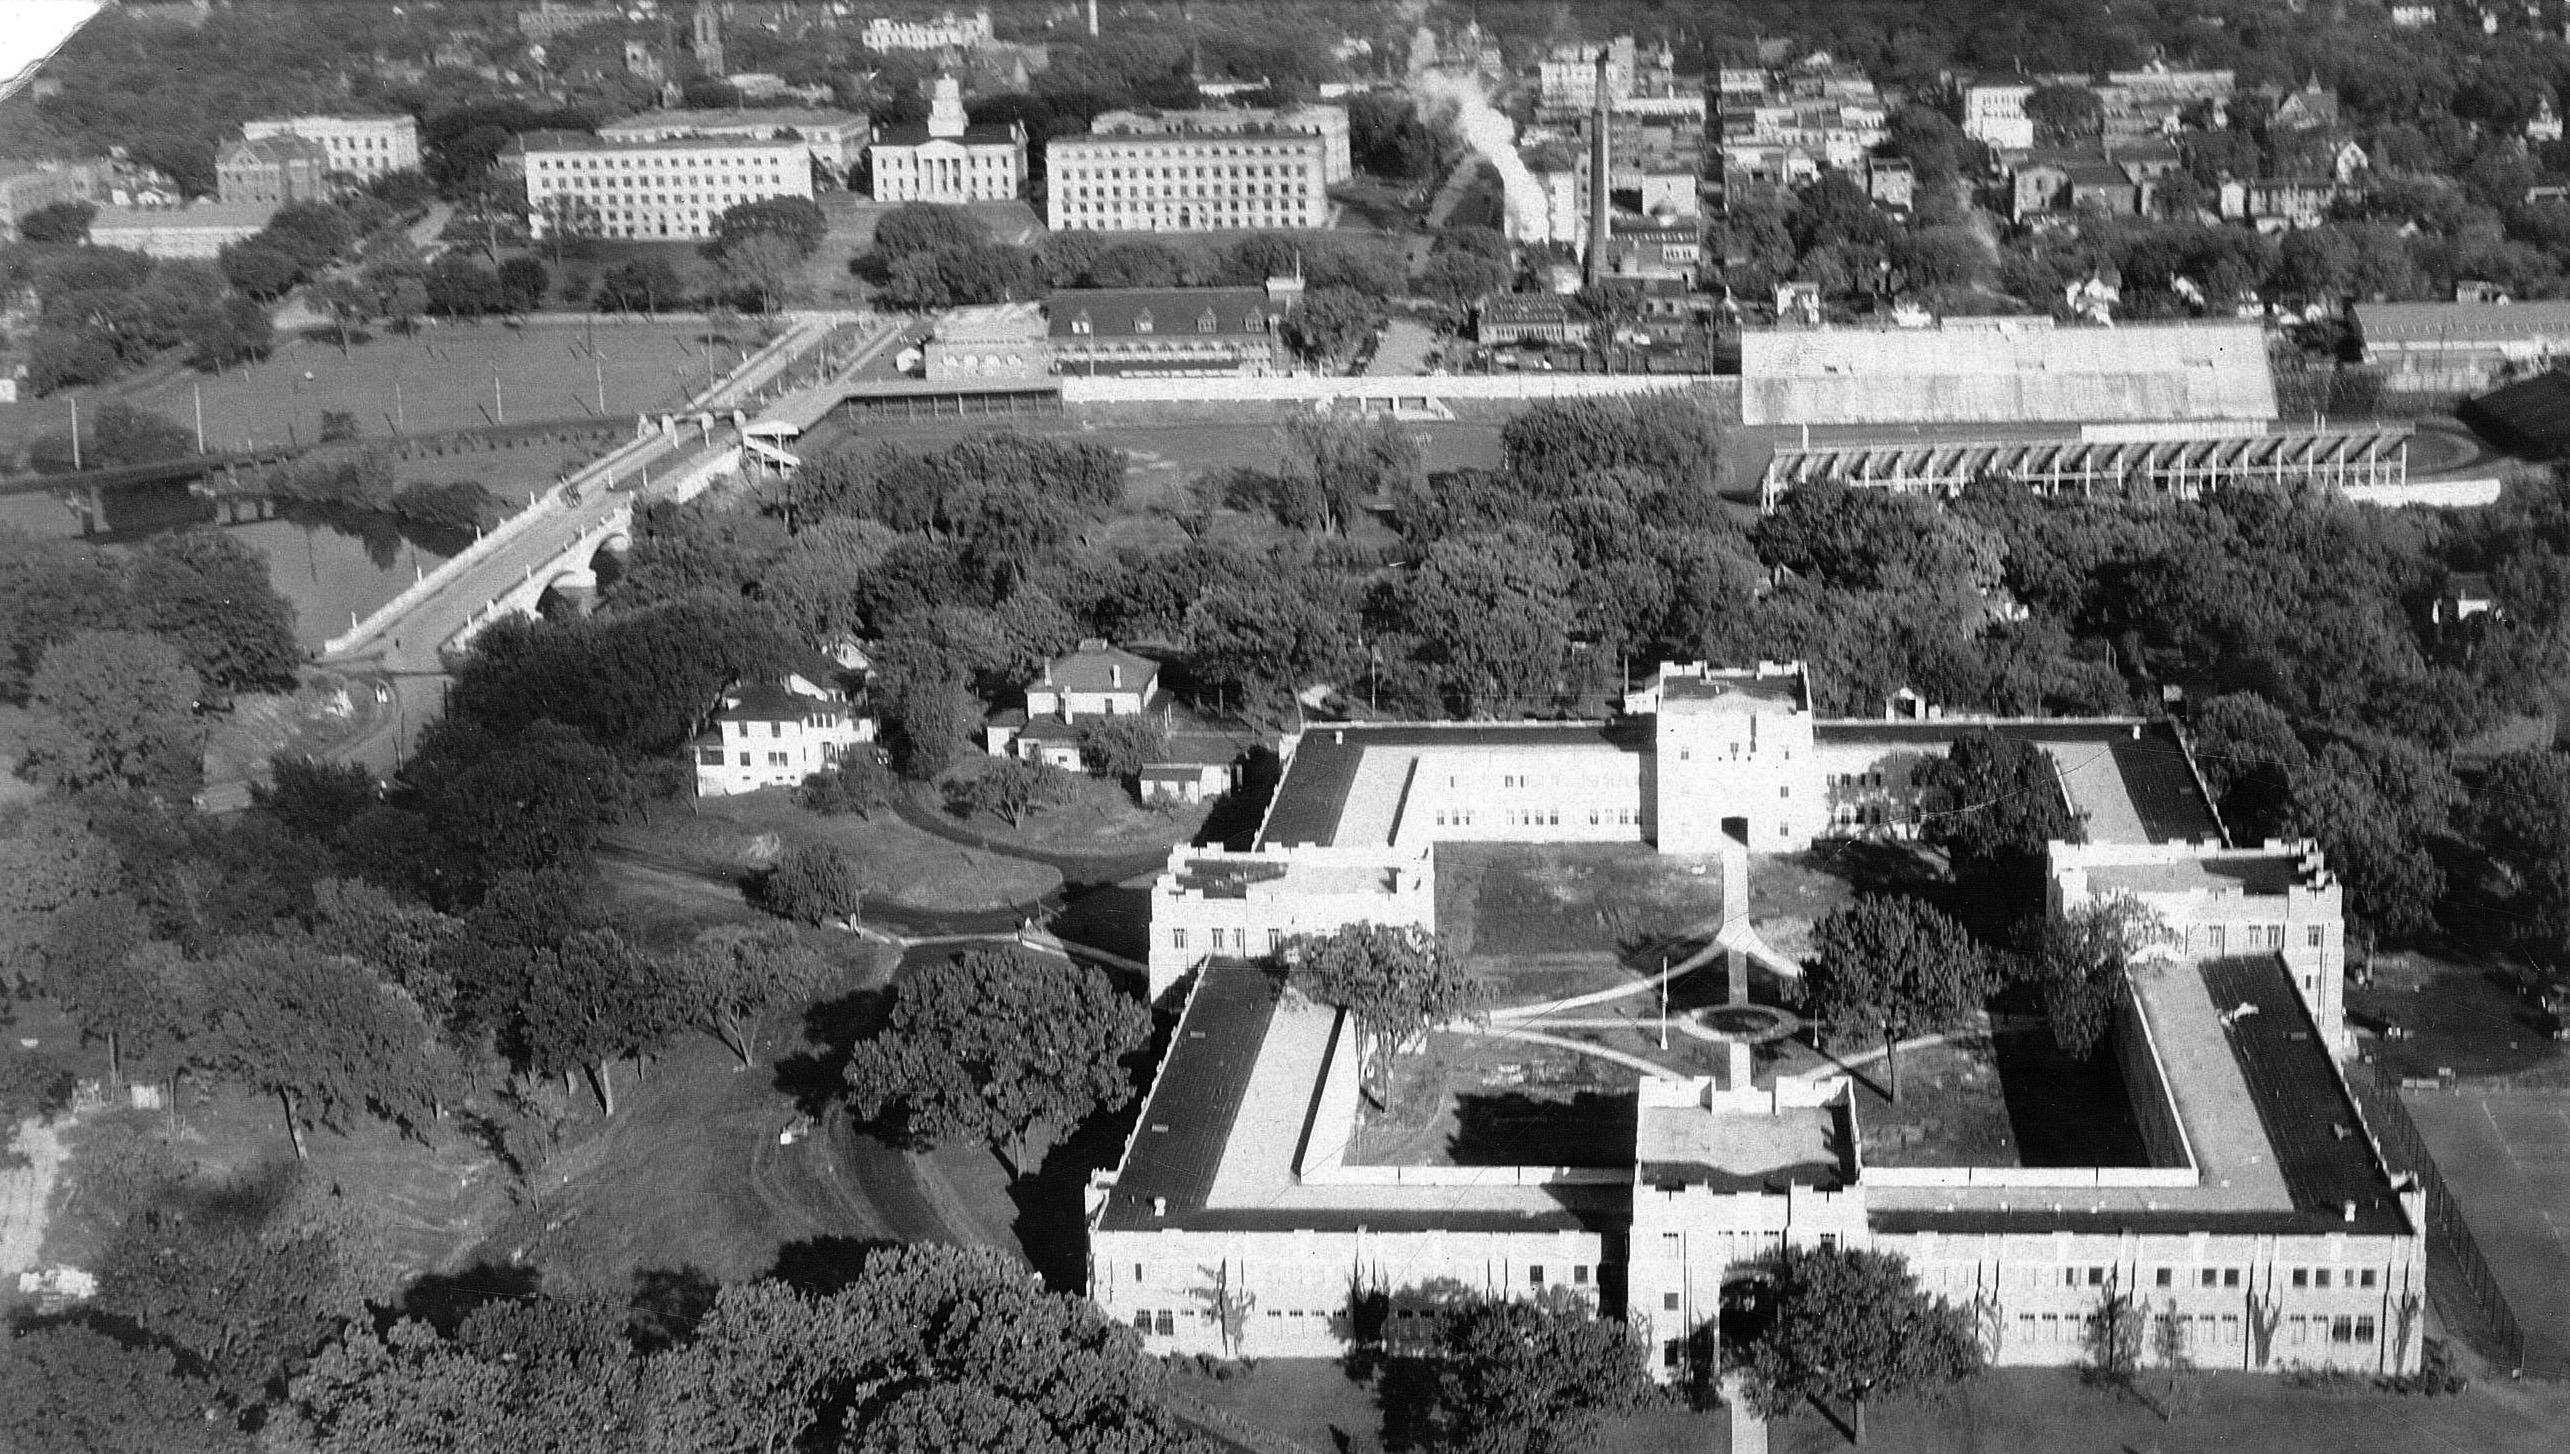 historic aerial view of Quadrangle